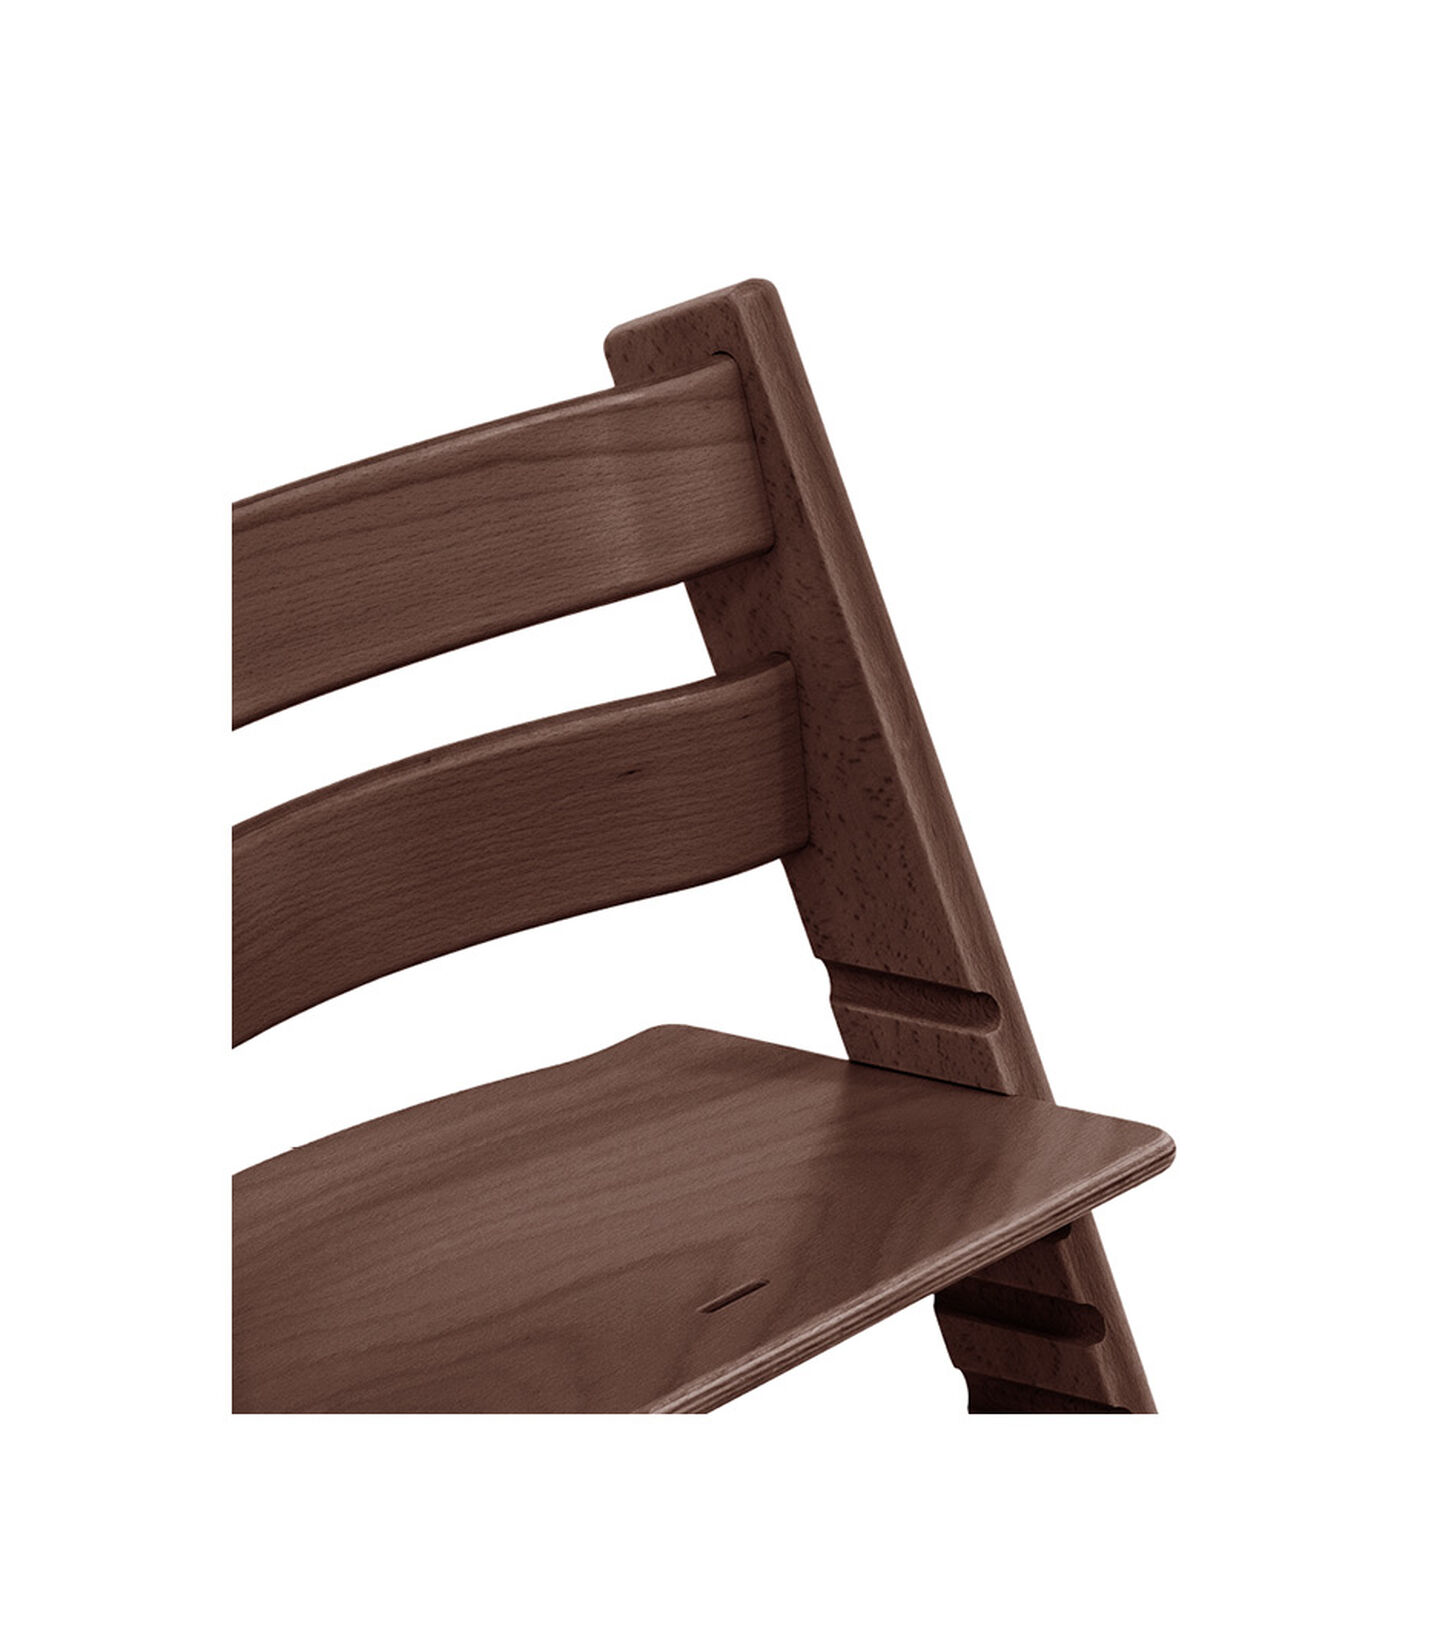 Tripp Trapp® Chair close up photo Walnut Brown view 3